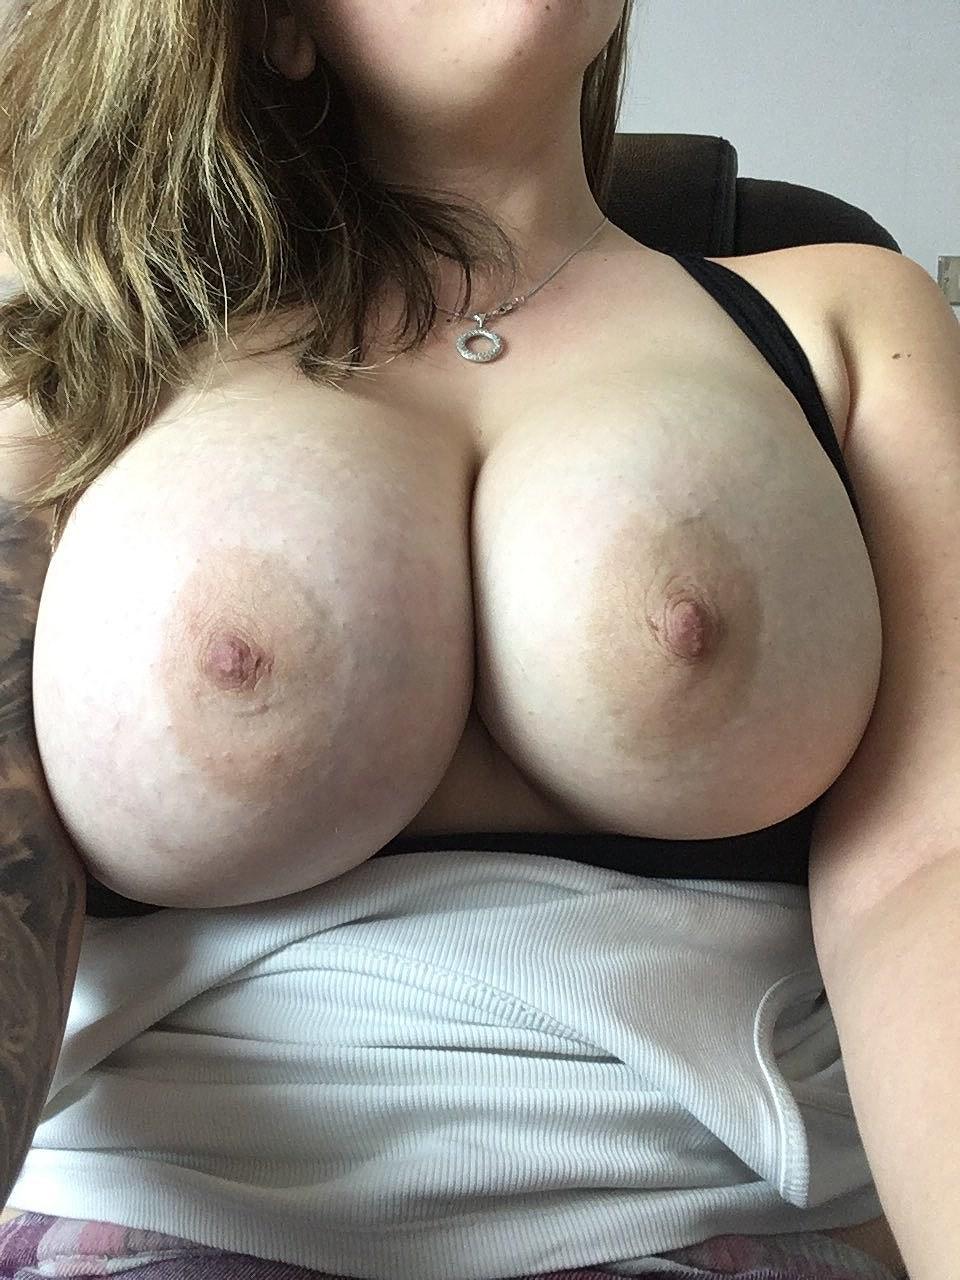 Bondage with sex toys